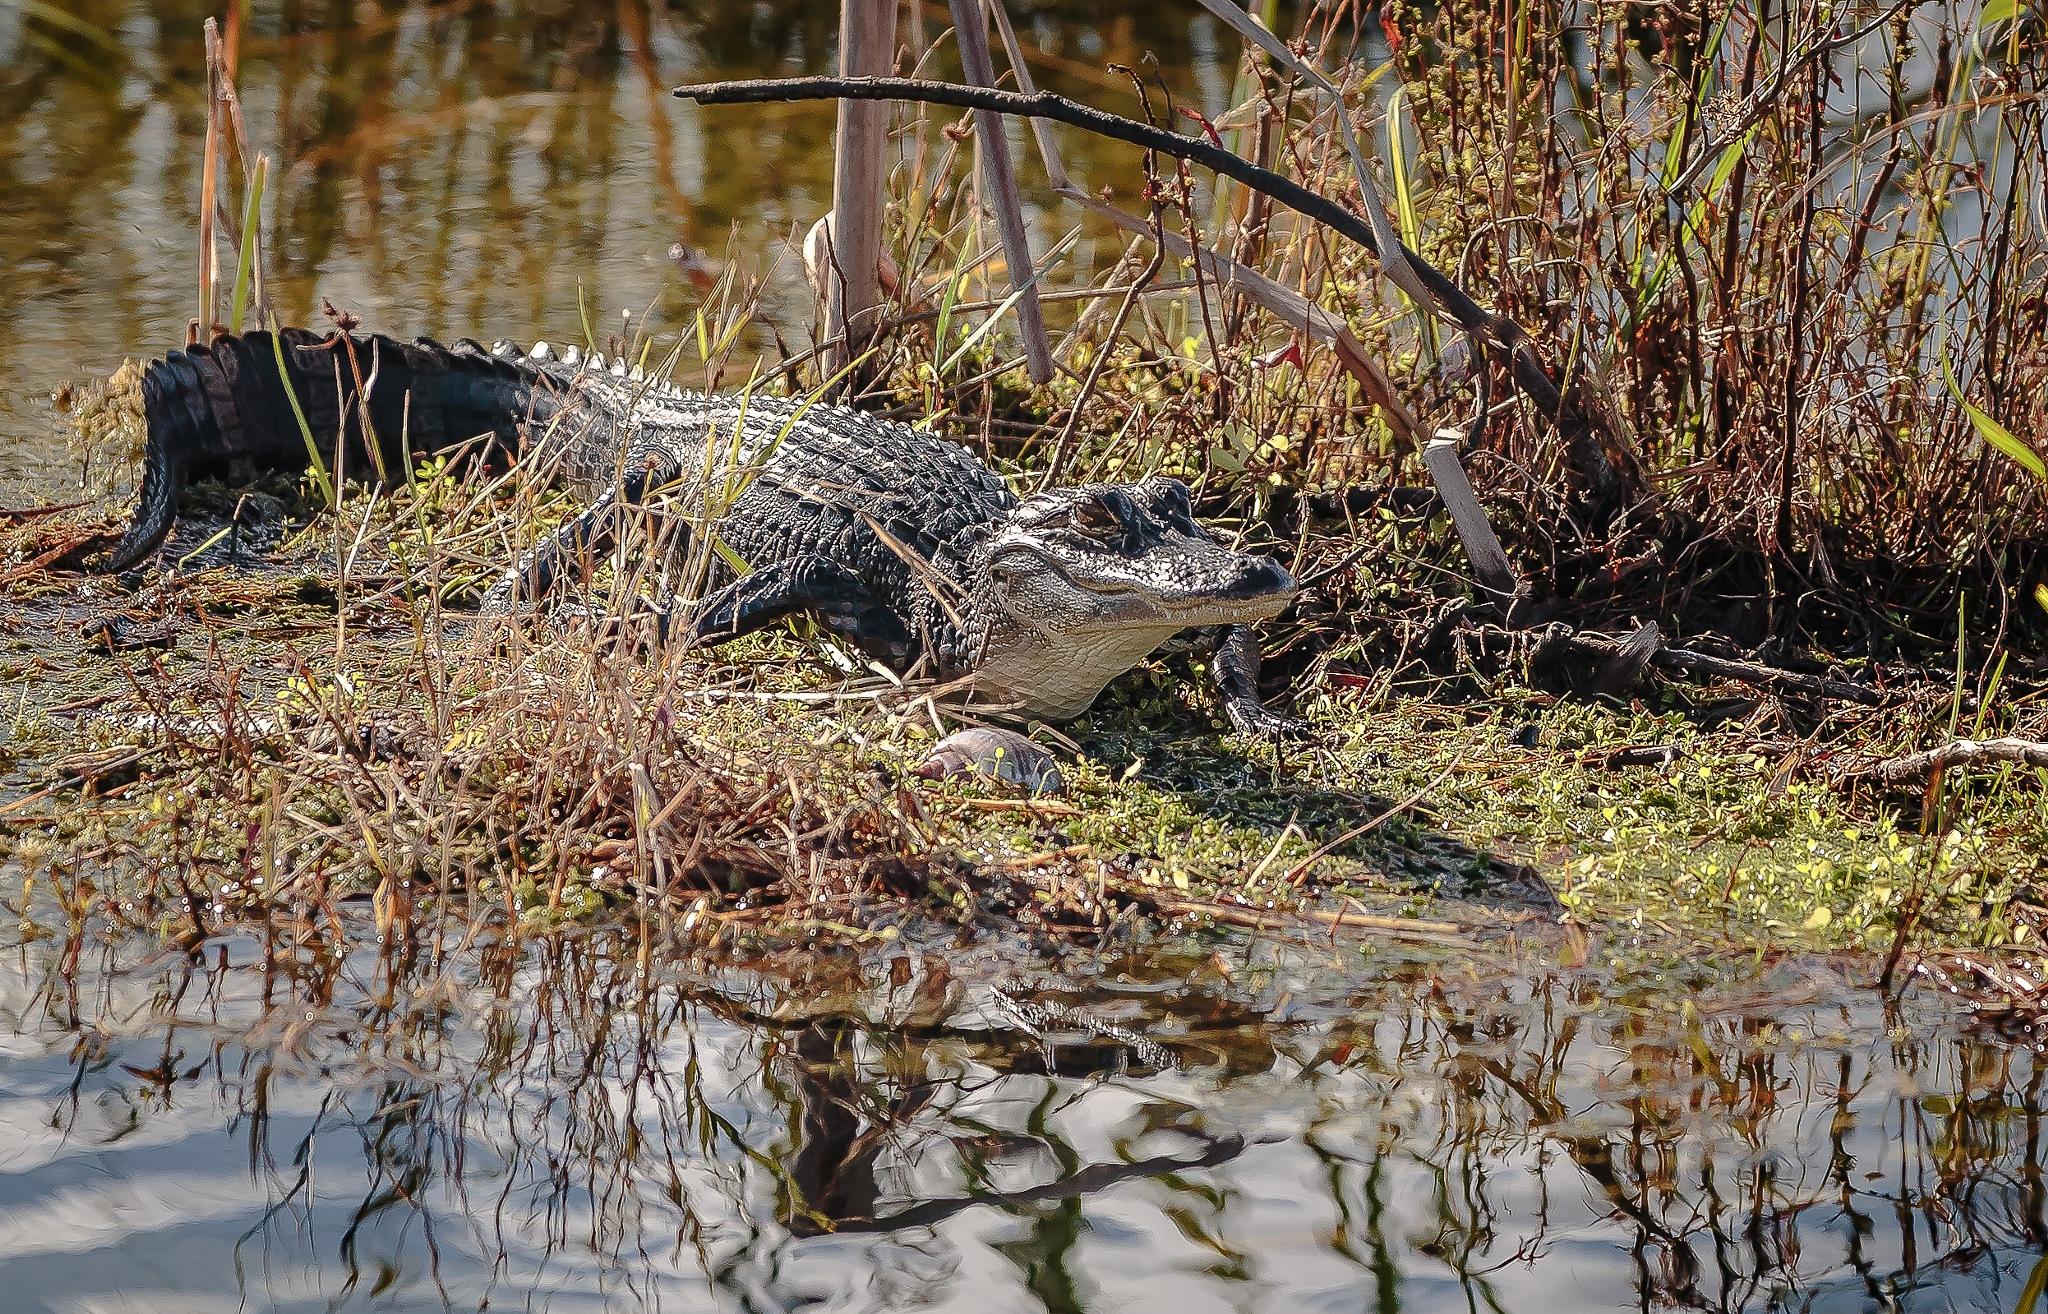 Everglades Wildlife by MaryBethMenden